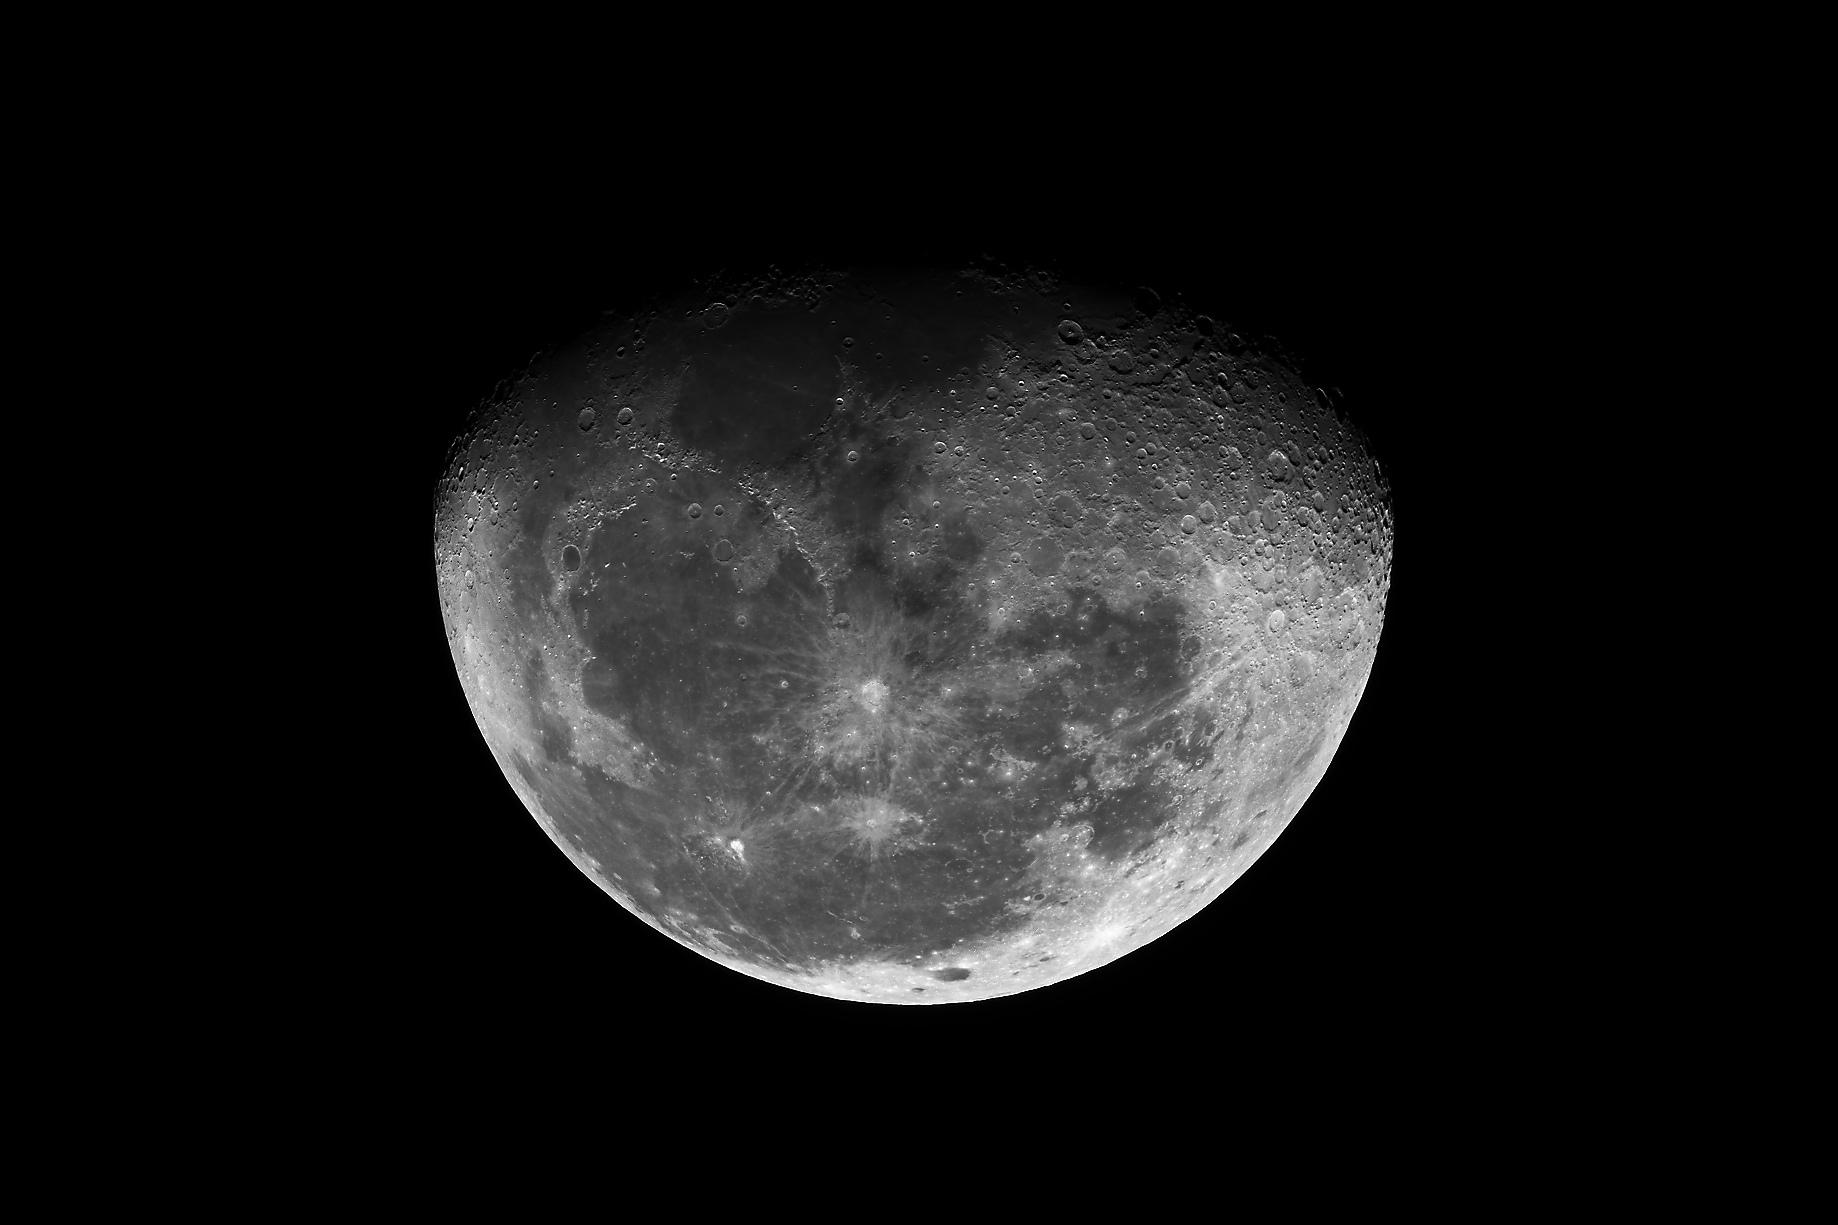 171010 - Lune gibbeuse - Pollux - STL11K